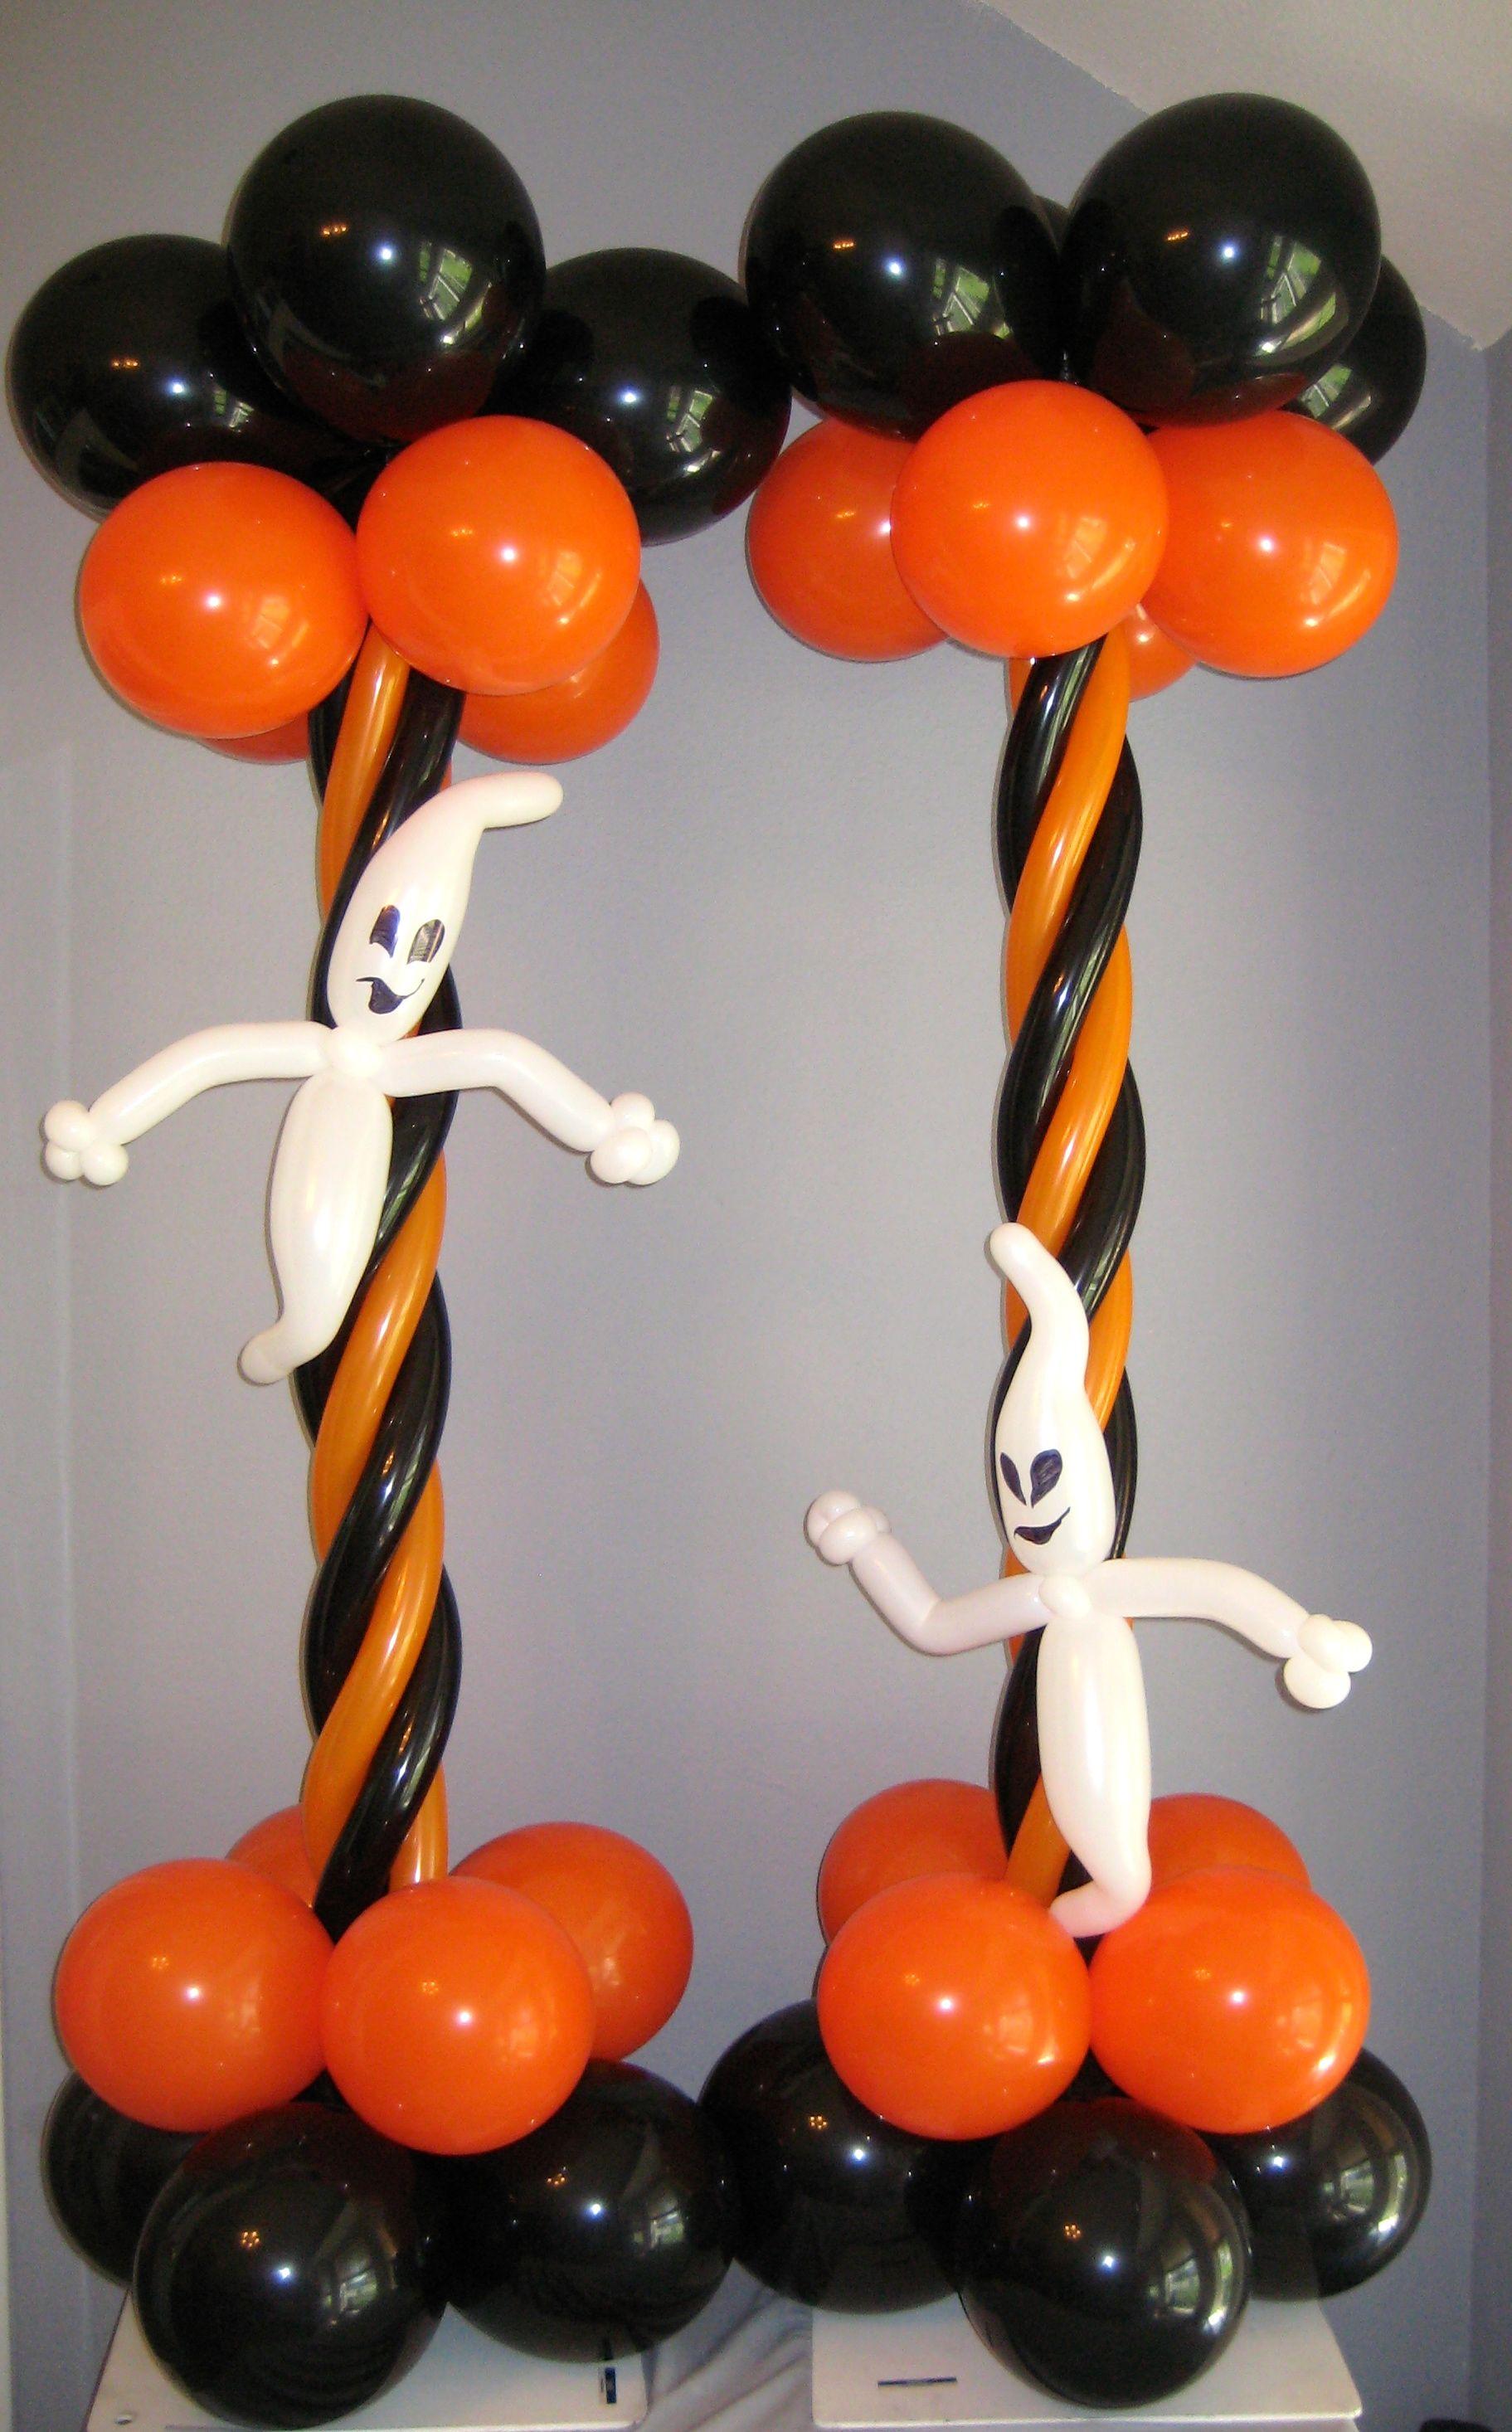 halloween balloon column halloween balloon decoration. Black Bedroom Furniture Sets. Home Design Ideas